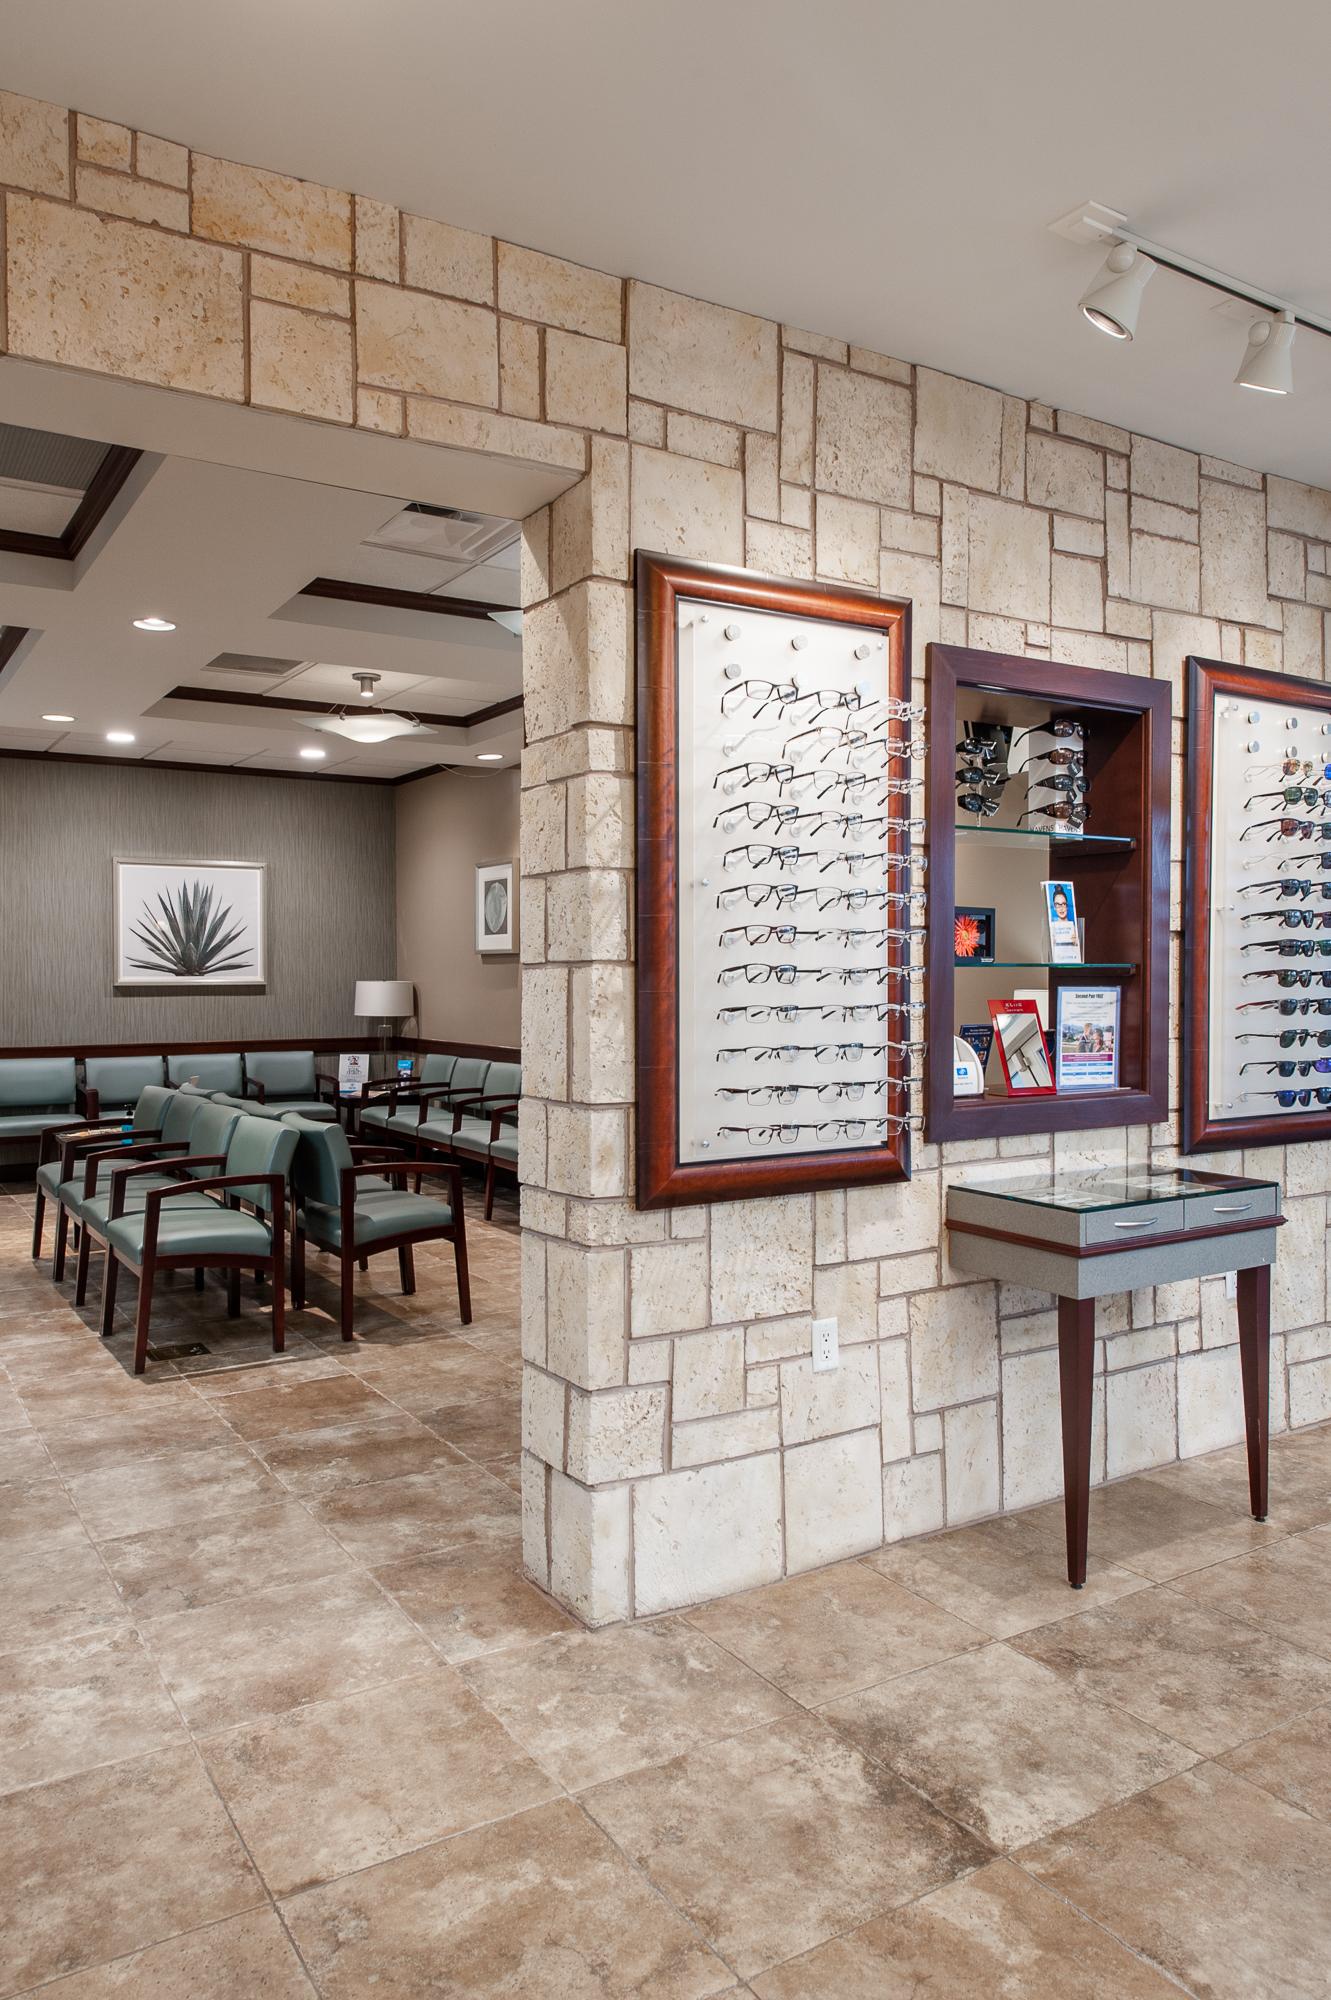 Micamy Design Studio_Interior Design_Clay Eye_Mandarin_Opthamology_Commercial_Office_Medical_Eye Care_Renovation_Crossville_Interiors_Artwork_Coastal_Crossville_Eykon8.jpg